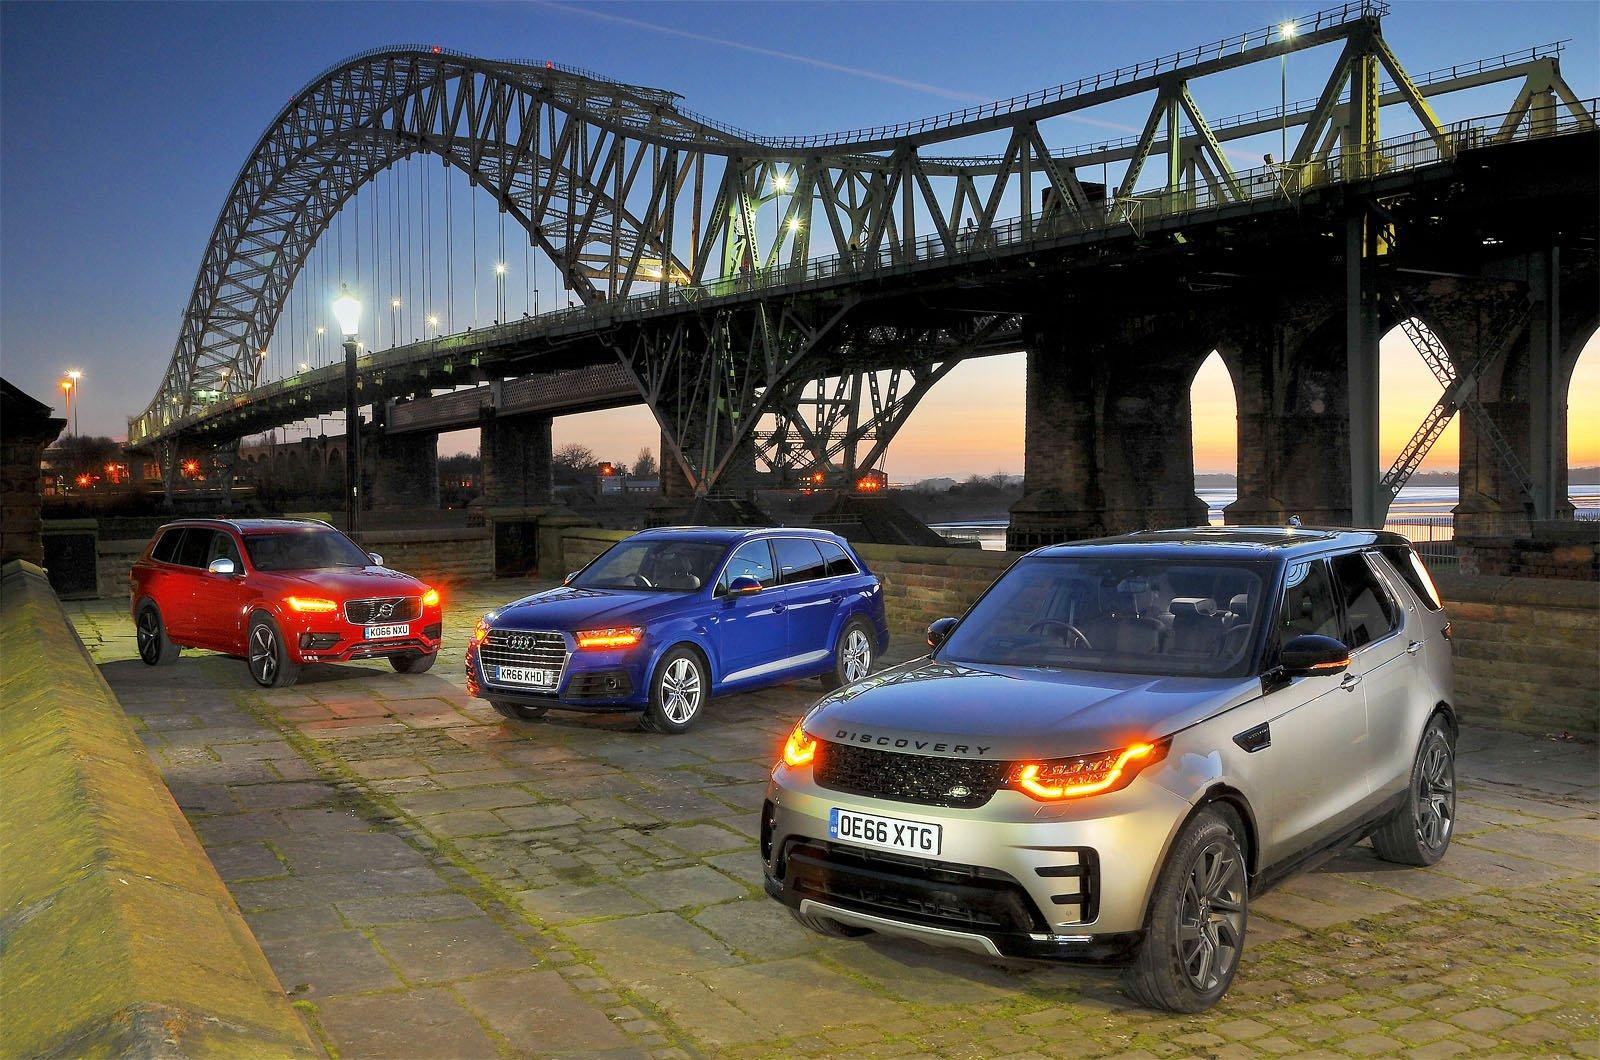 Audi Q7 vs Land Rover Discovery vs Volvo XC90 under bridge